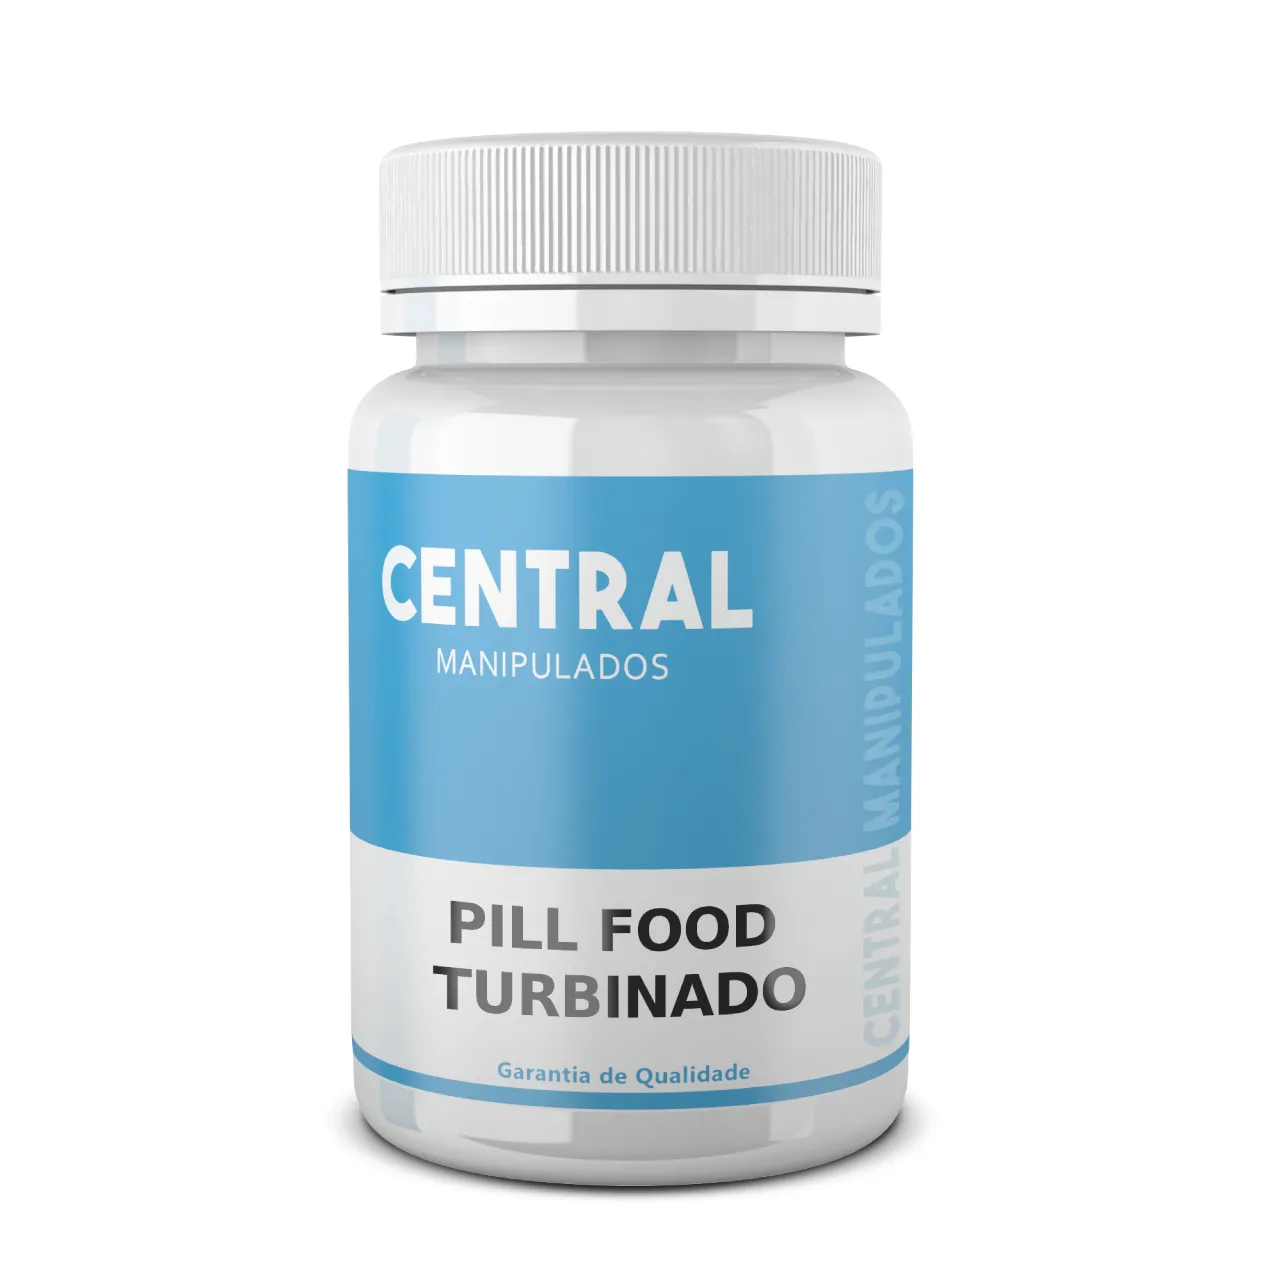 Central Pill Food Turbinado - 120 cápsulas - complexo vitamínico Central Manipulados